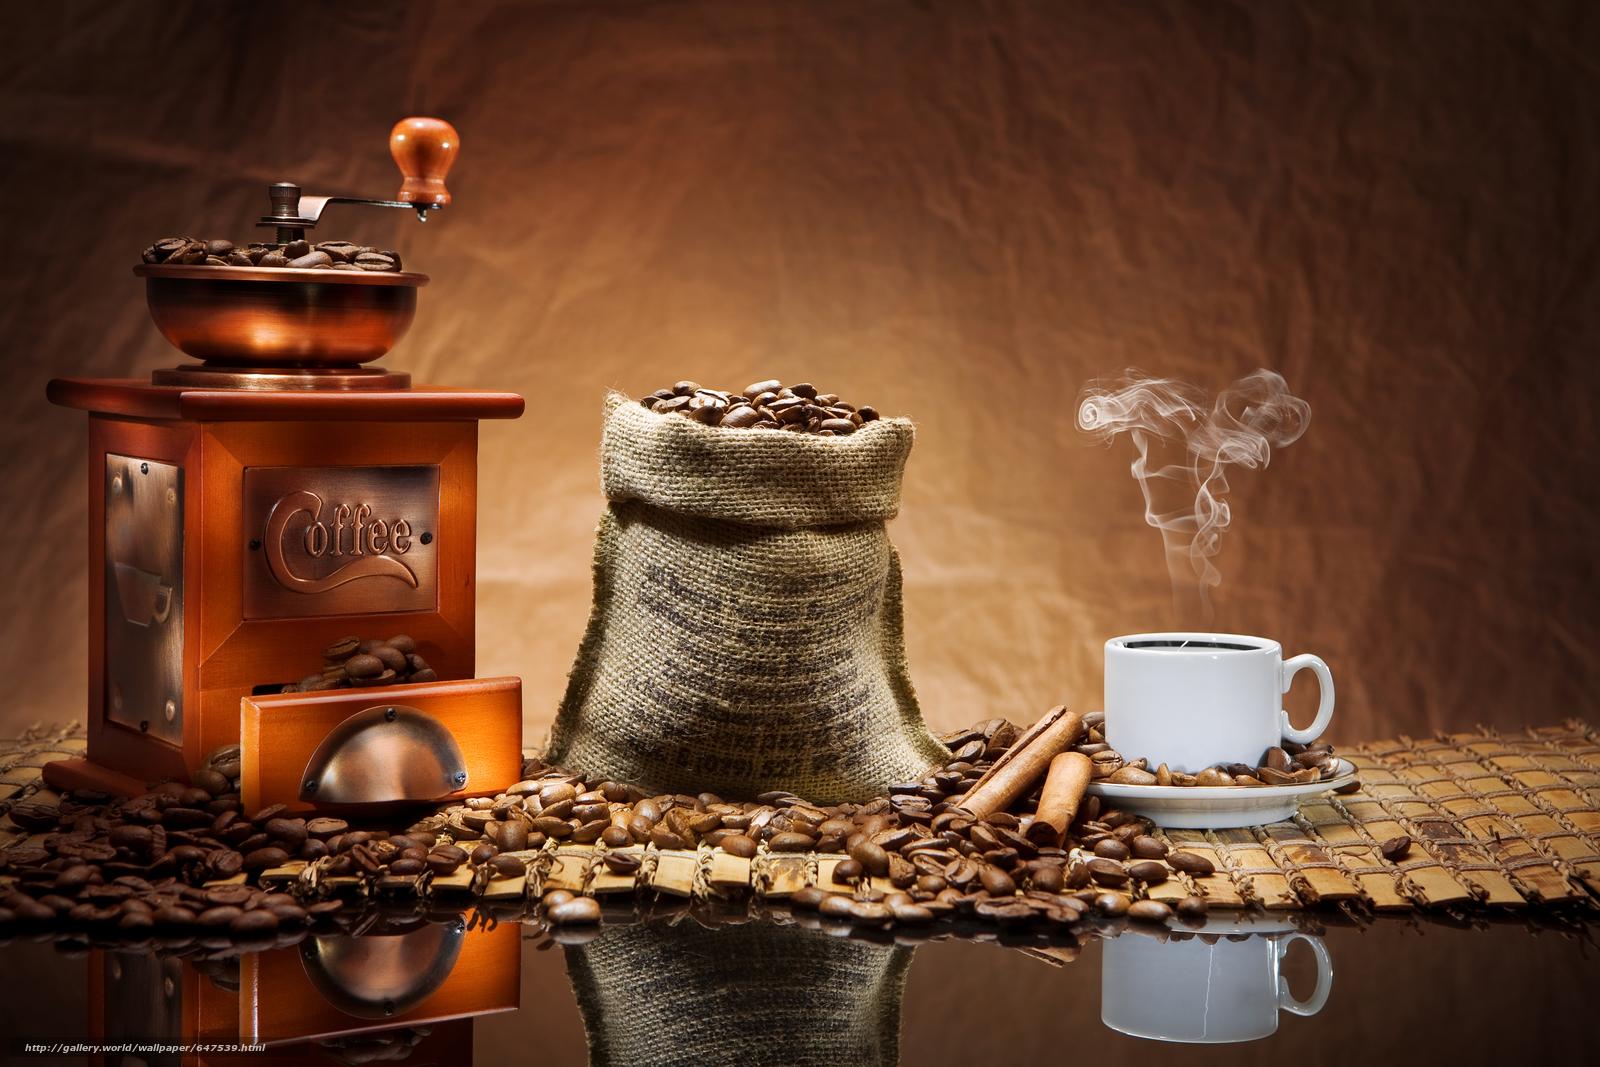 Download wallpaper coffee,  Grain,  mug free desktop wallpaper in the resolution 8736x5824 — picture №647539